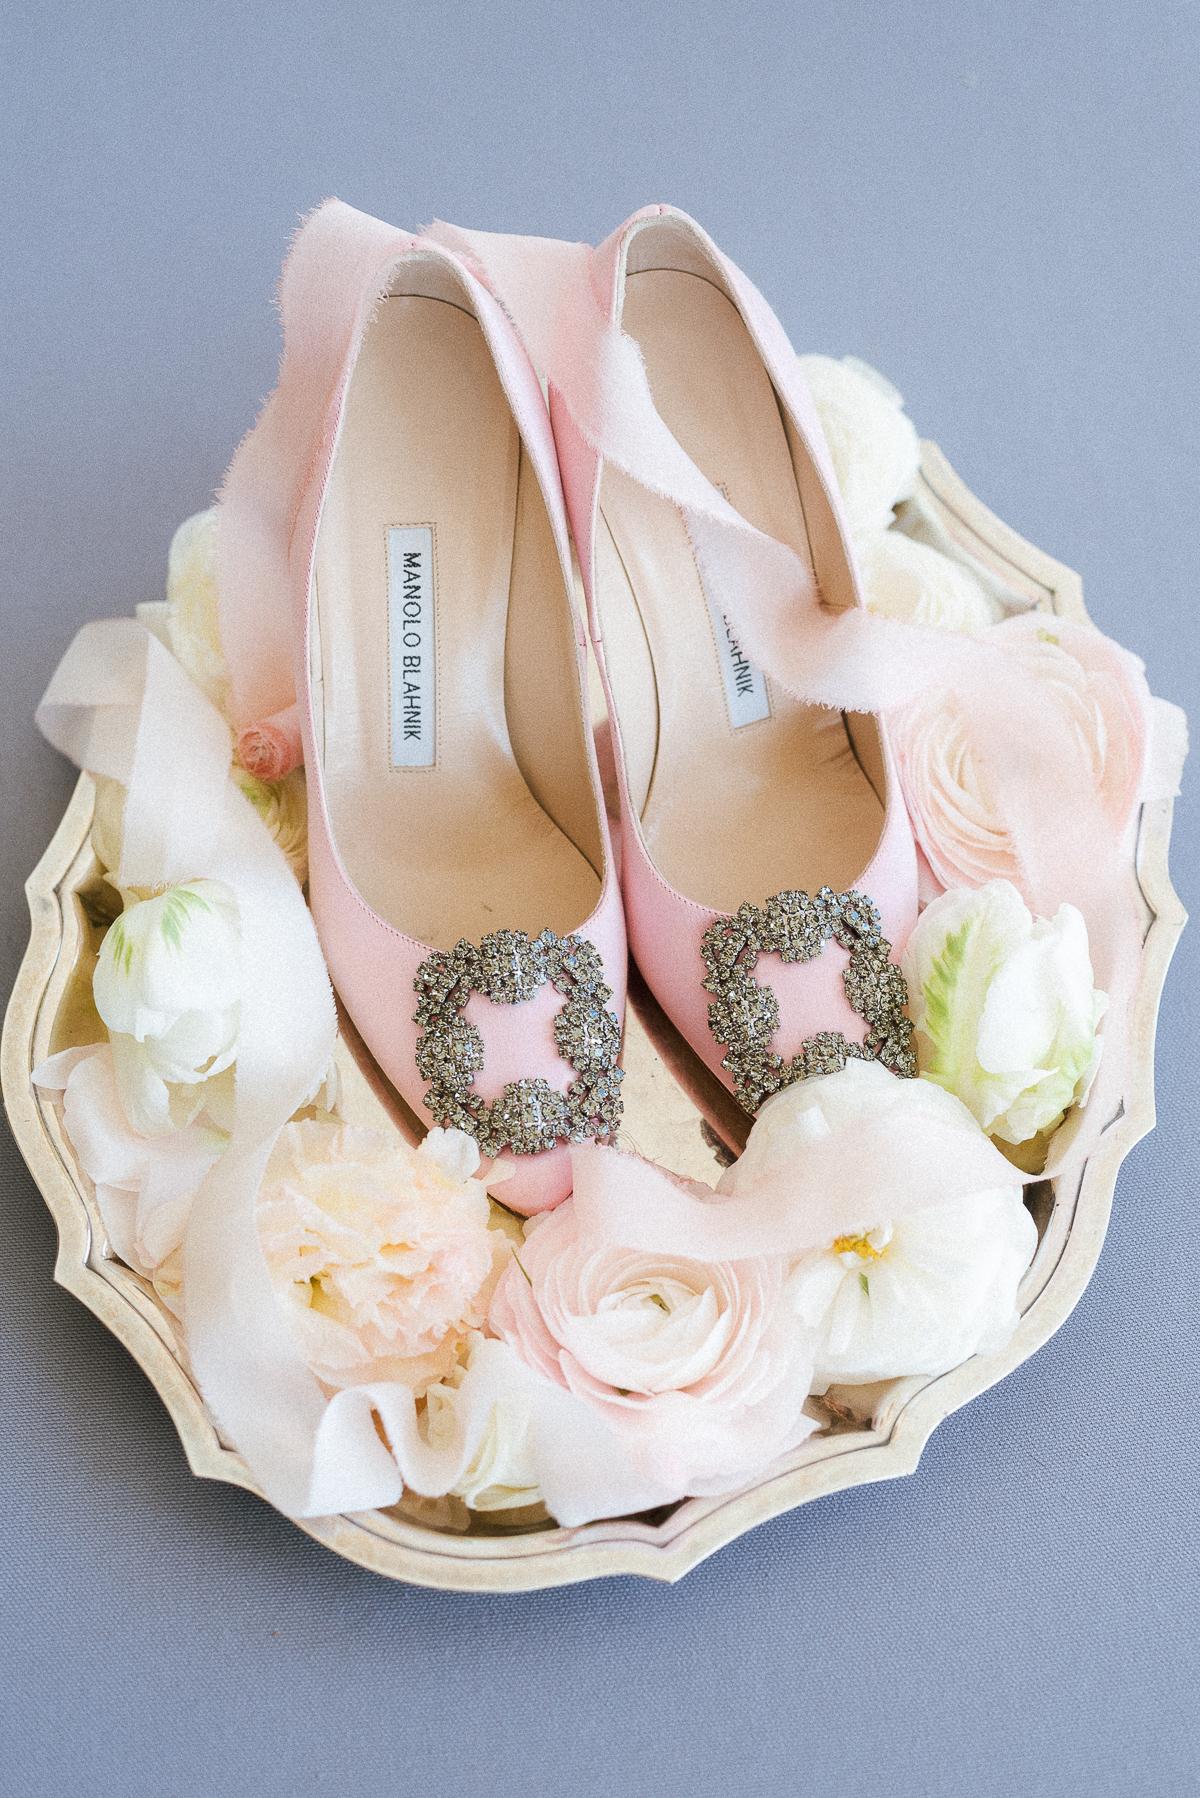 MD-Wedding-Photographer-Styling-Silk-Ribbon-Jefferson-Lane-Designs-22.jpg